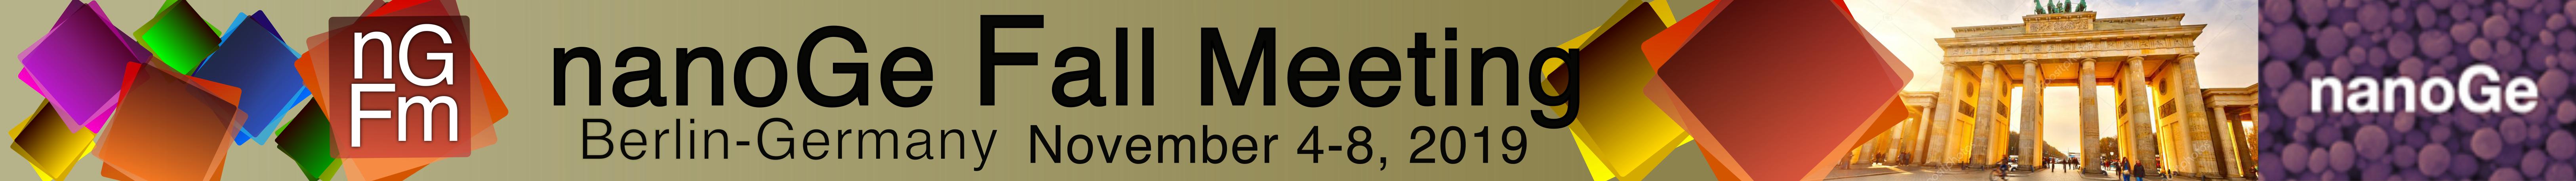 nanoGe - nanoGe conferences